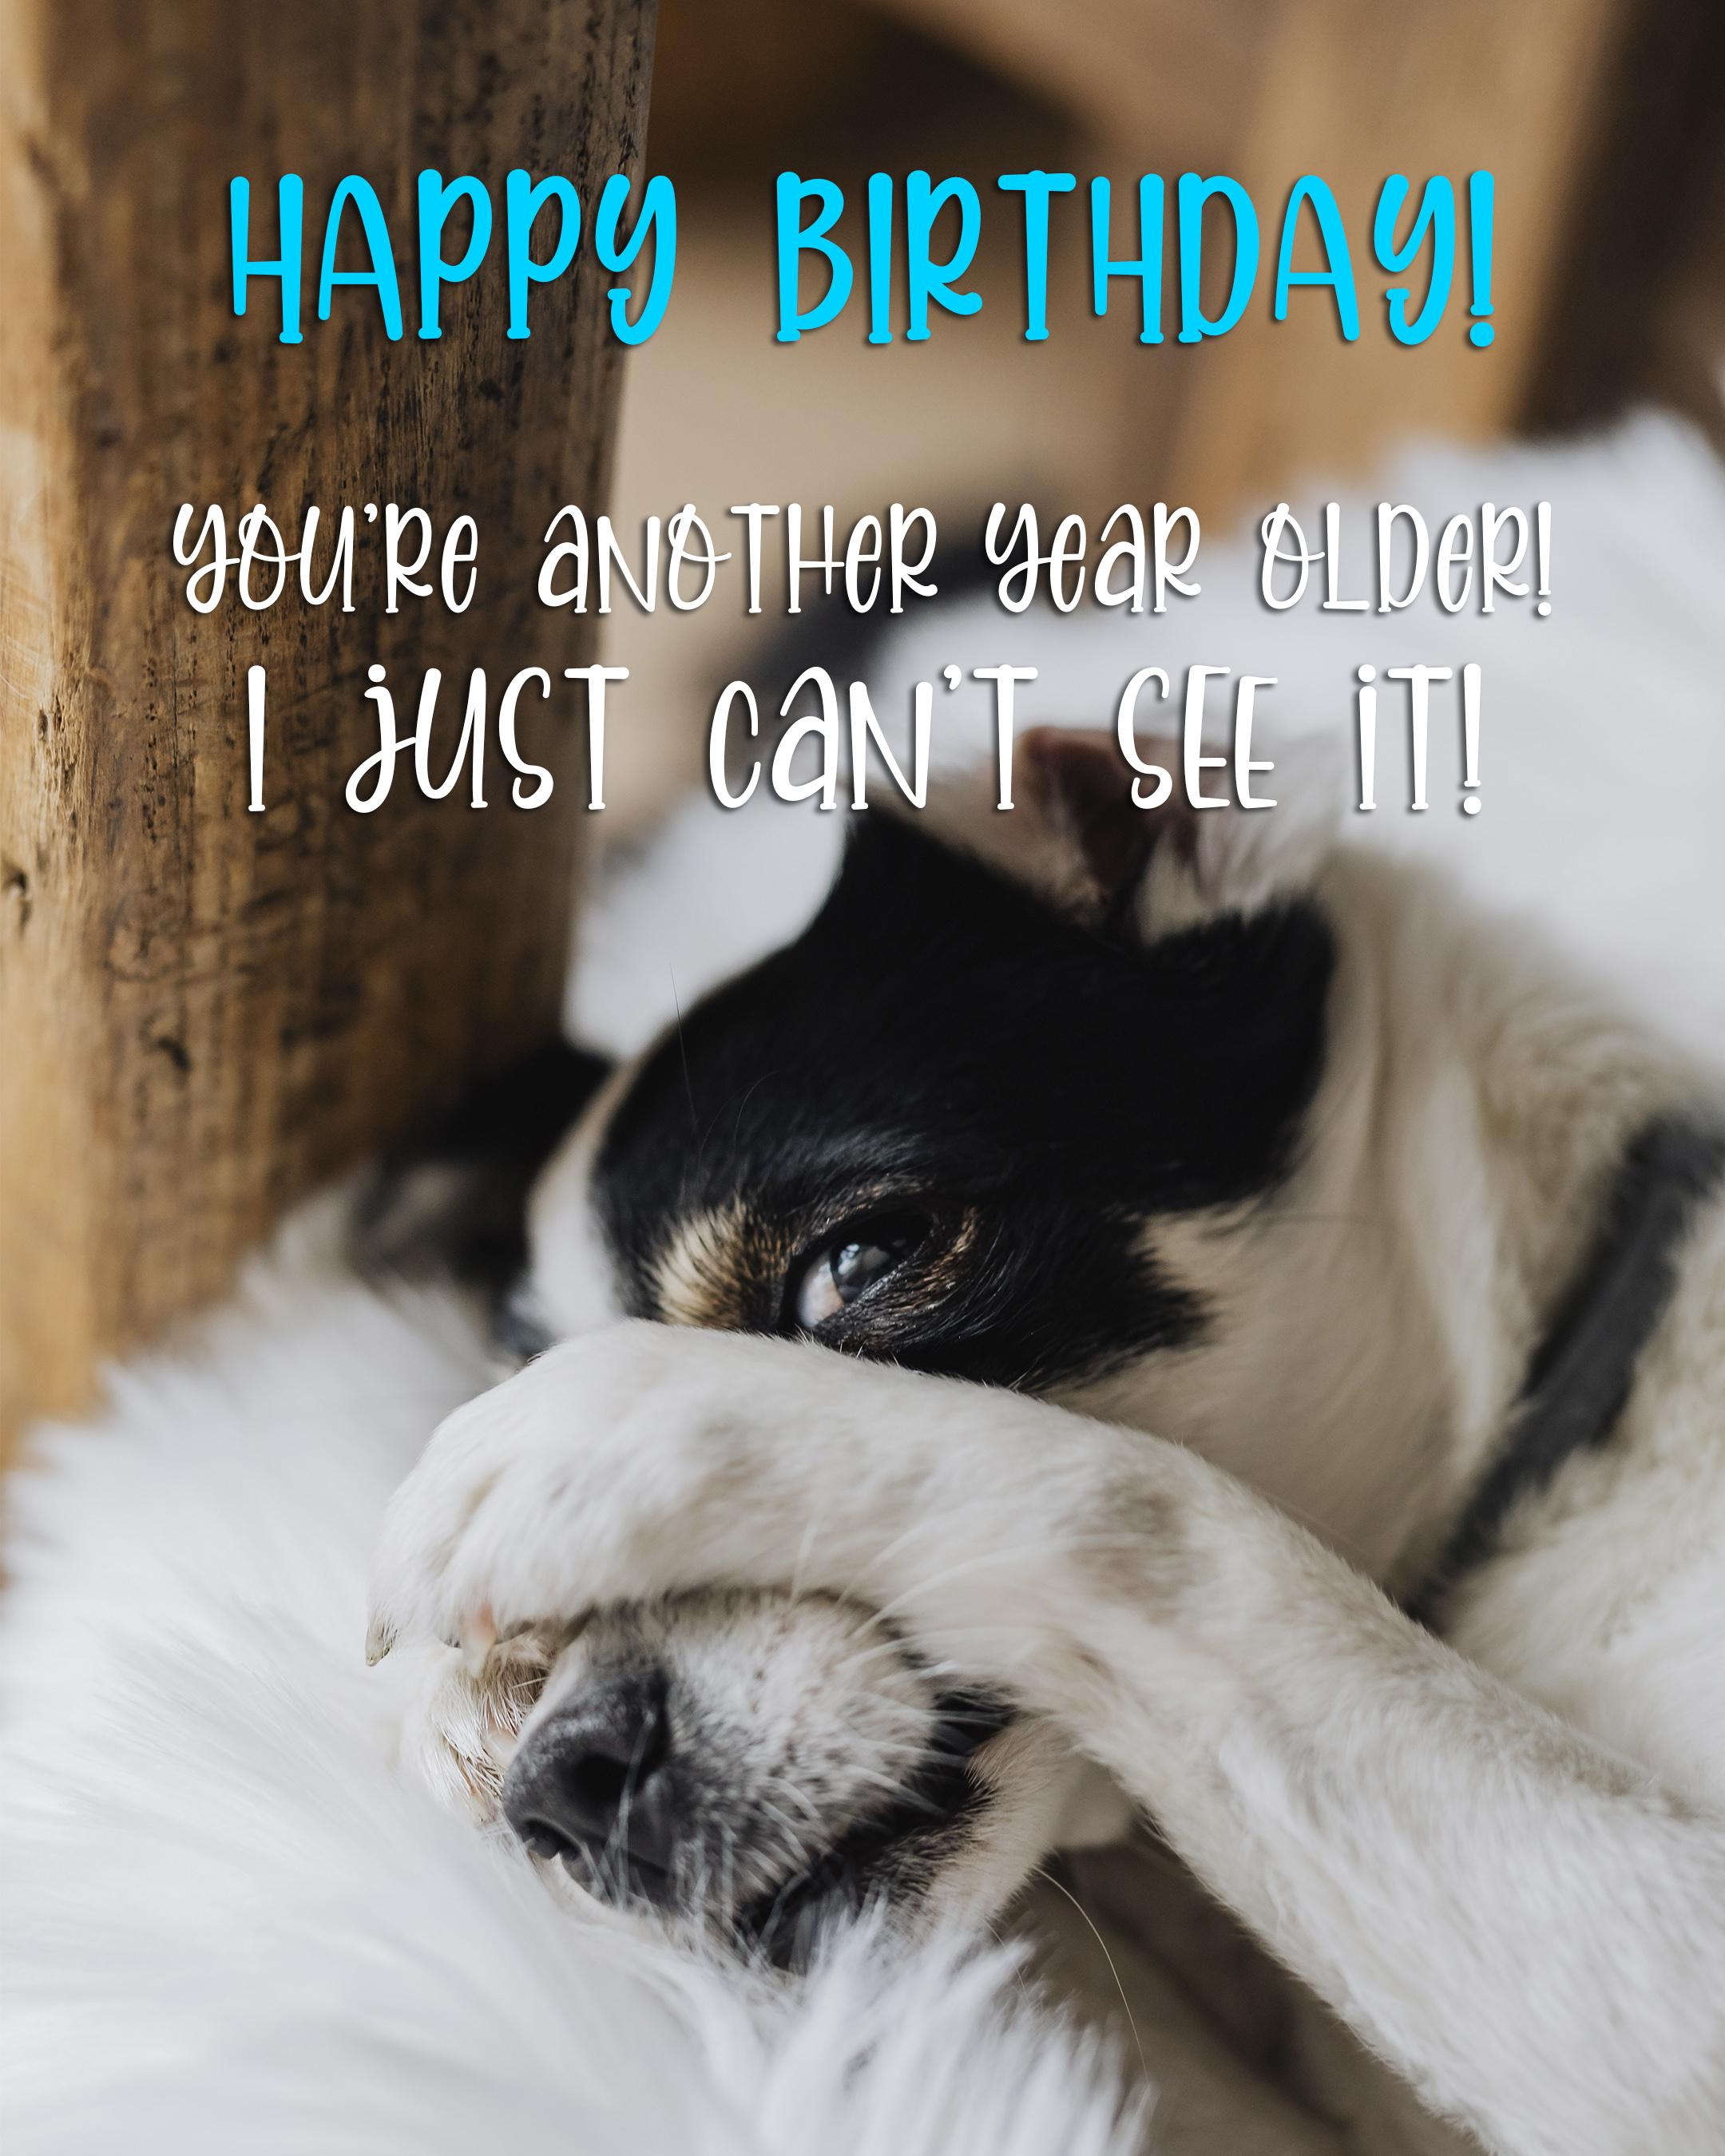 Free Happy birthday Image For Him (Man) With Funny Dog - birthdayimg.com